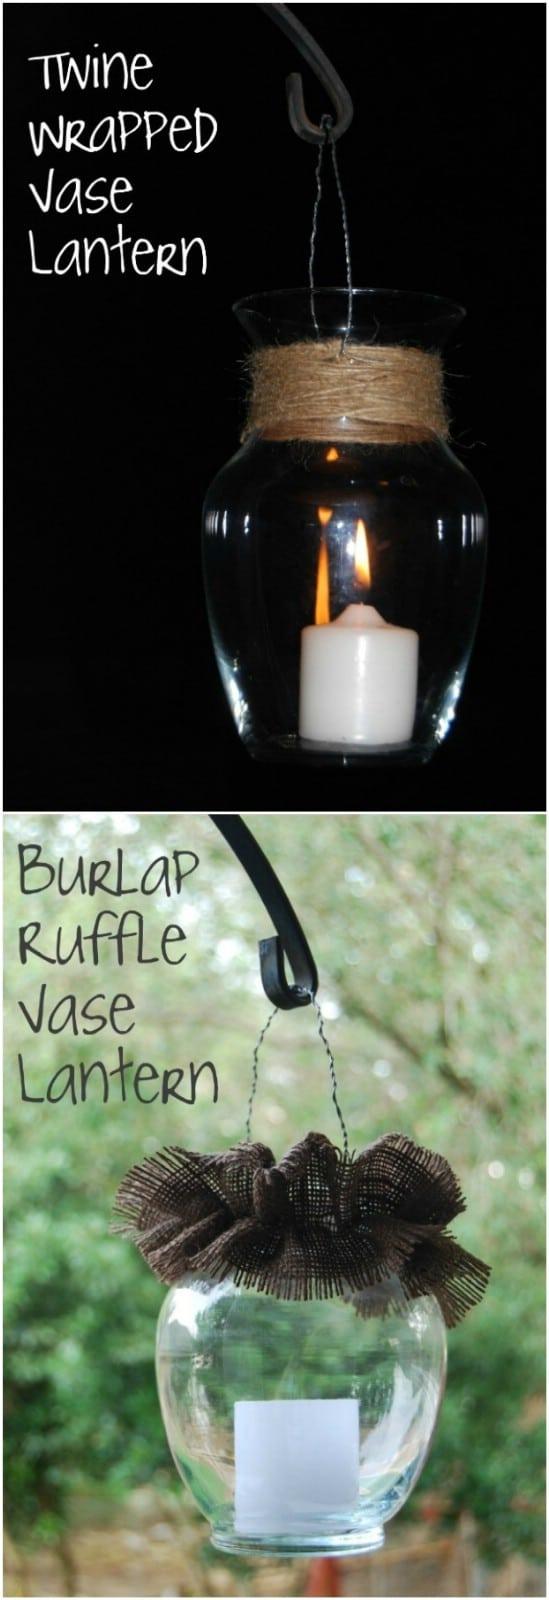 Burlap Ruffle Base Lantern